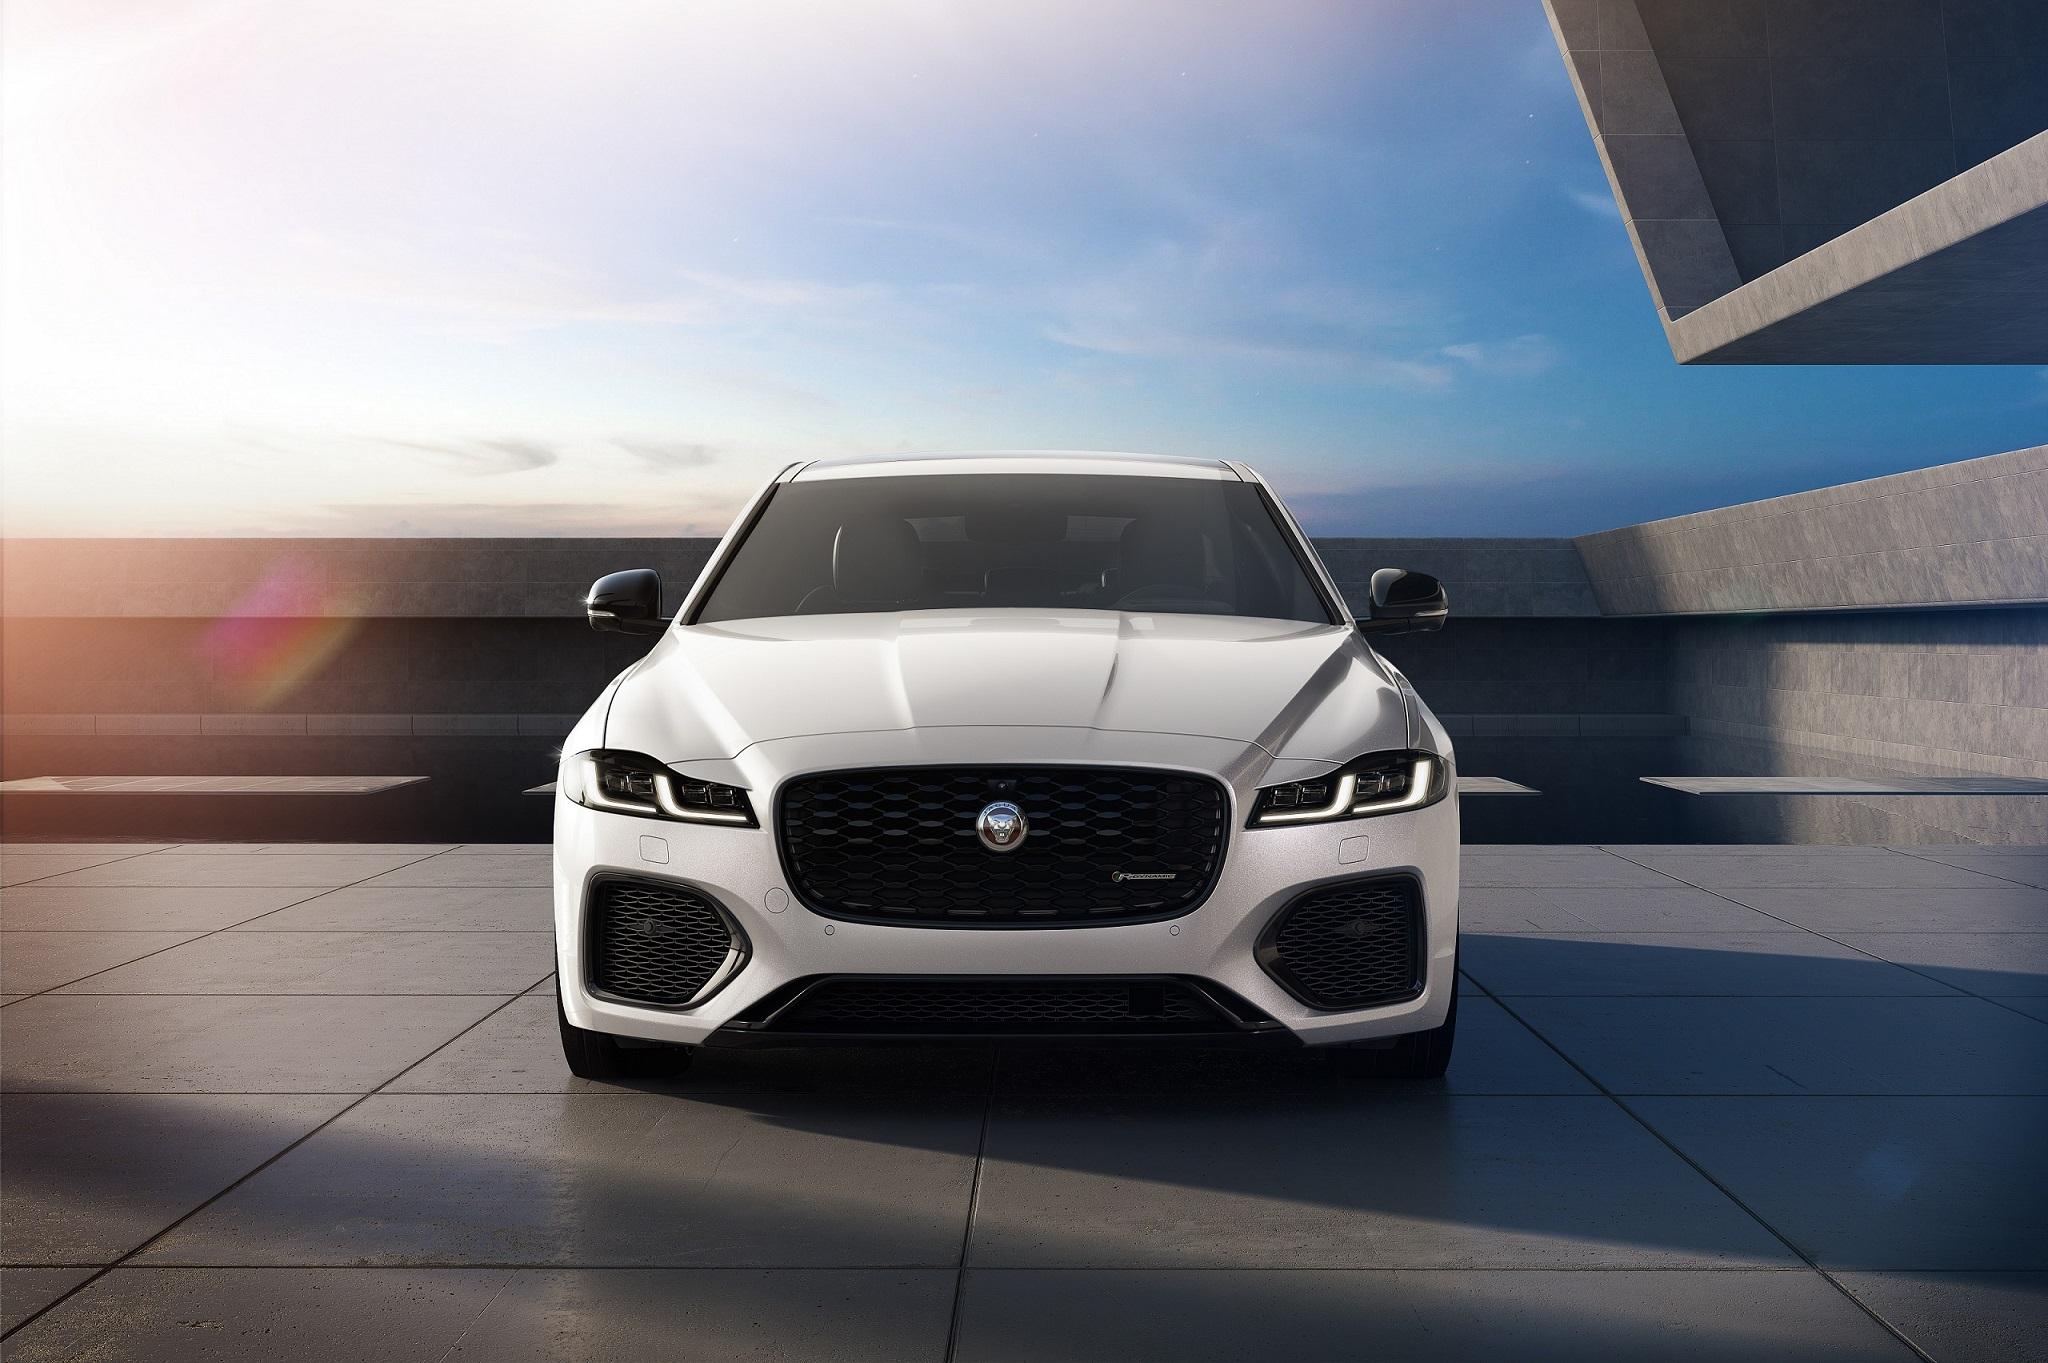 Jaguar Xf And Xe R-Dynamic Black